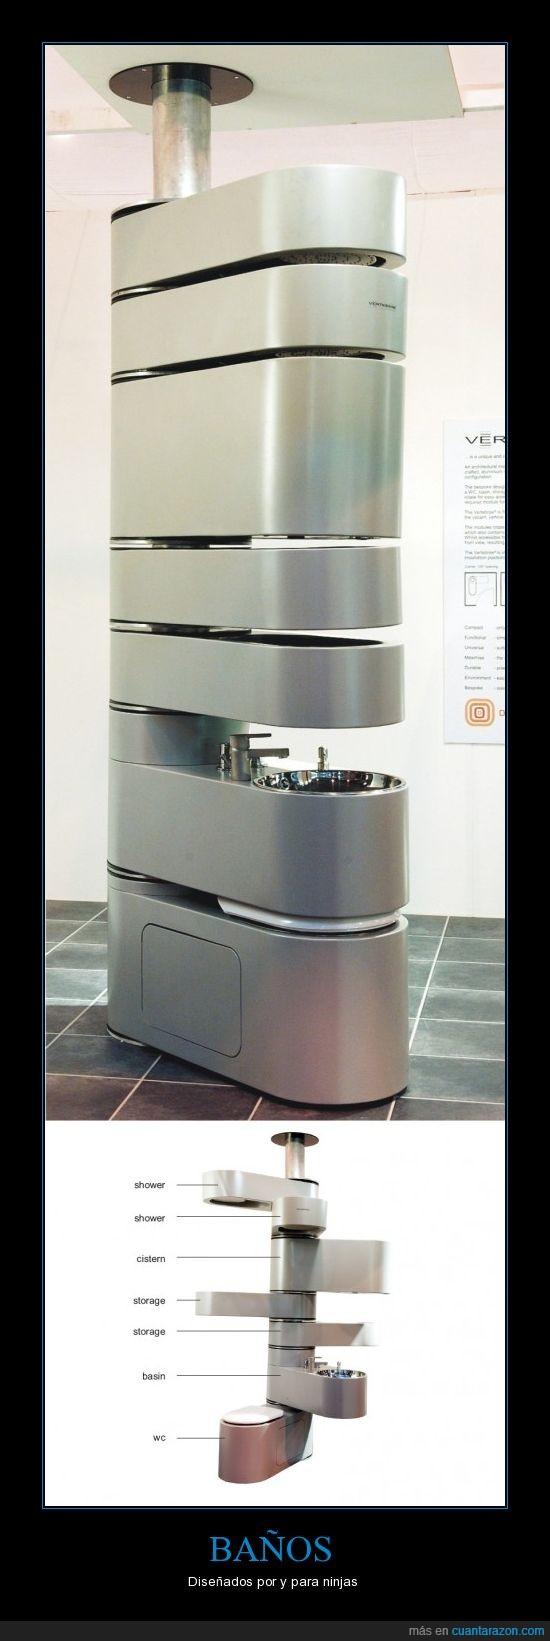 baño,fregadero,ninja,wc